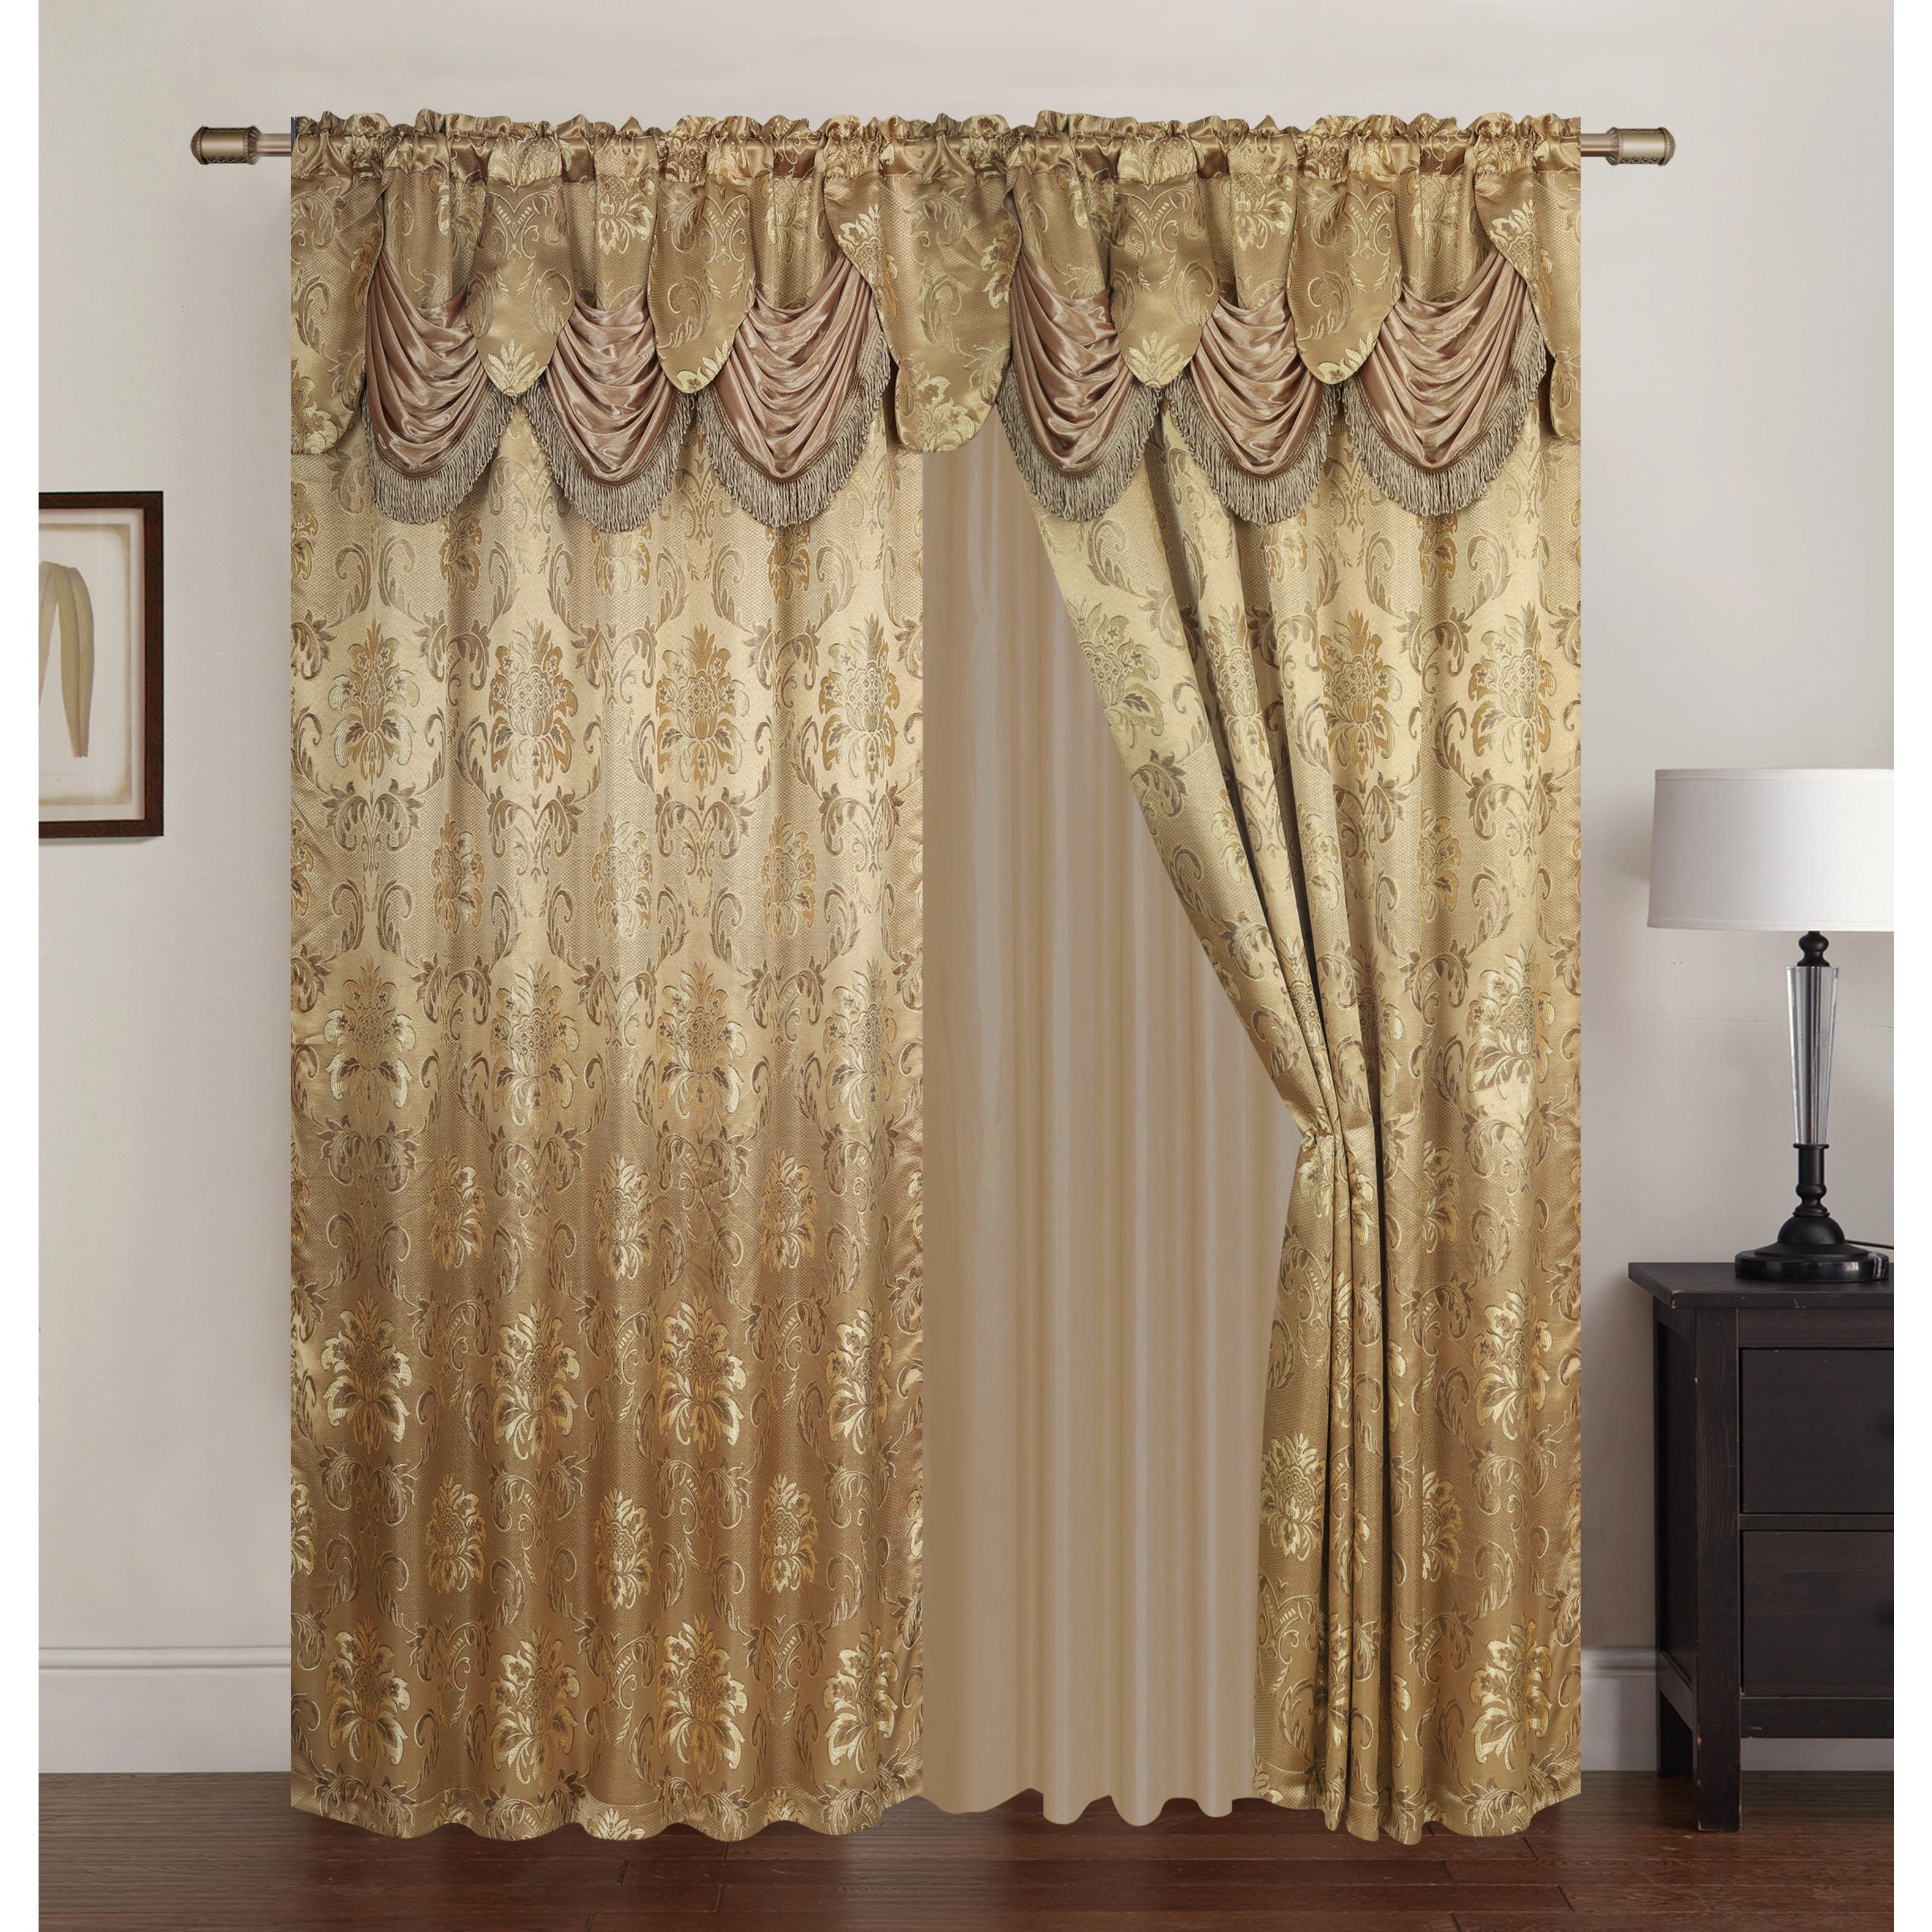 pocket walmart curtain pair jacquards accents valance rod com scroll tuscan stripe curtains ip window